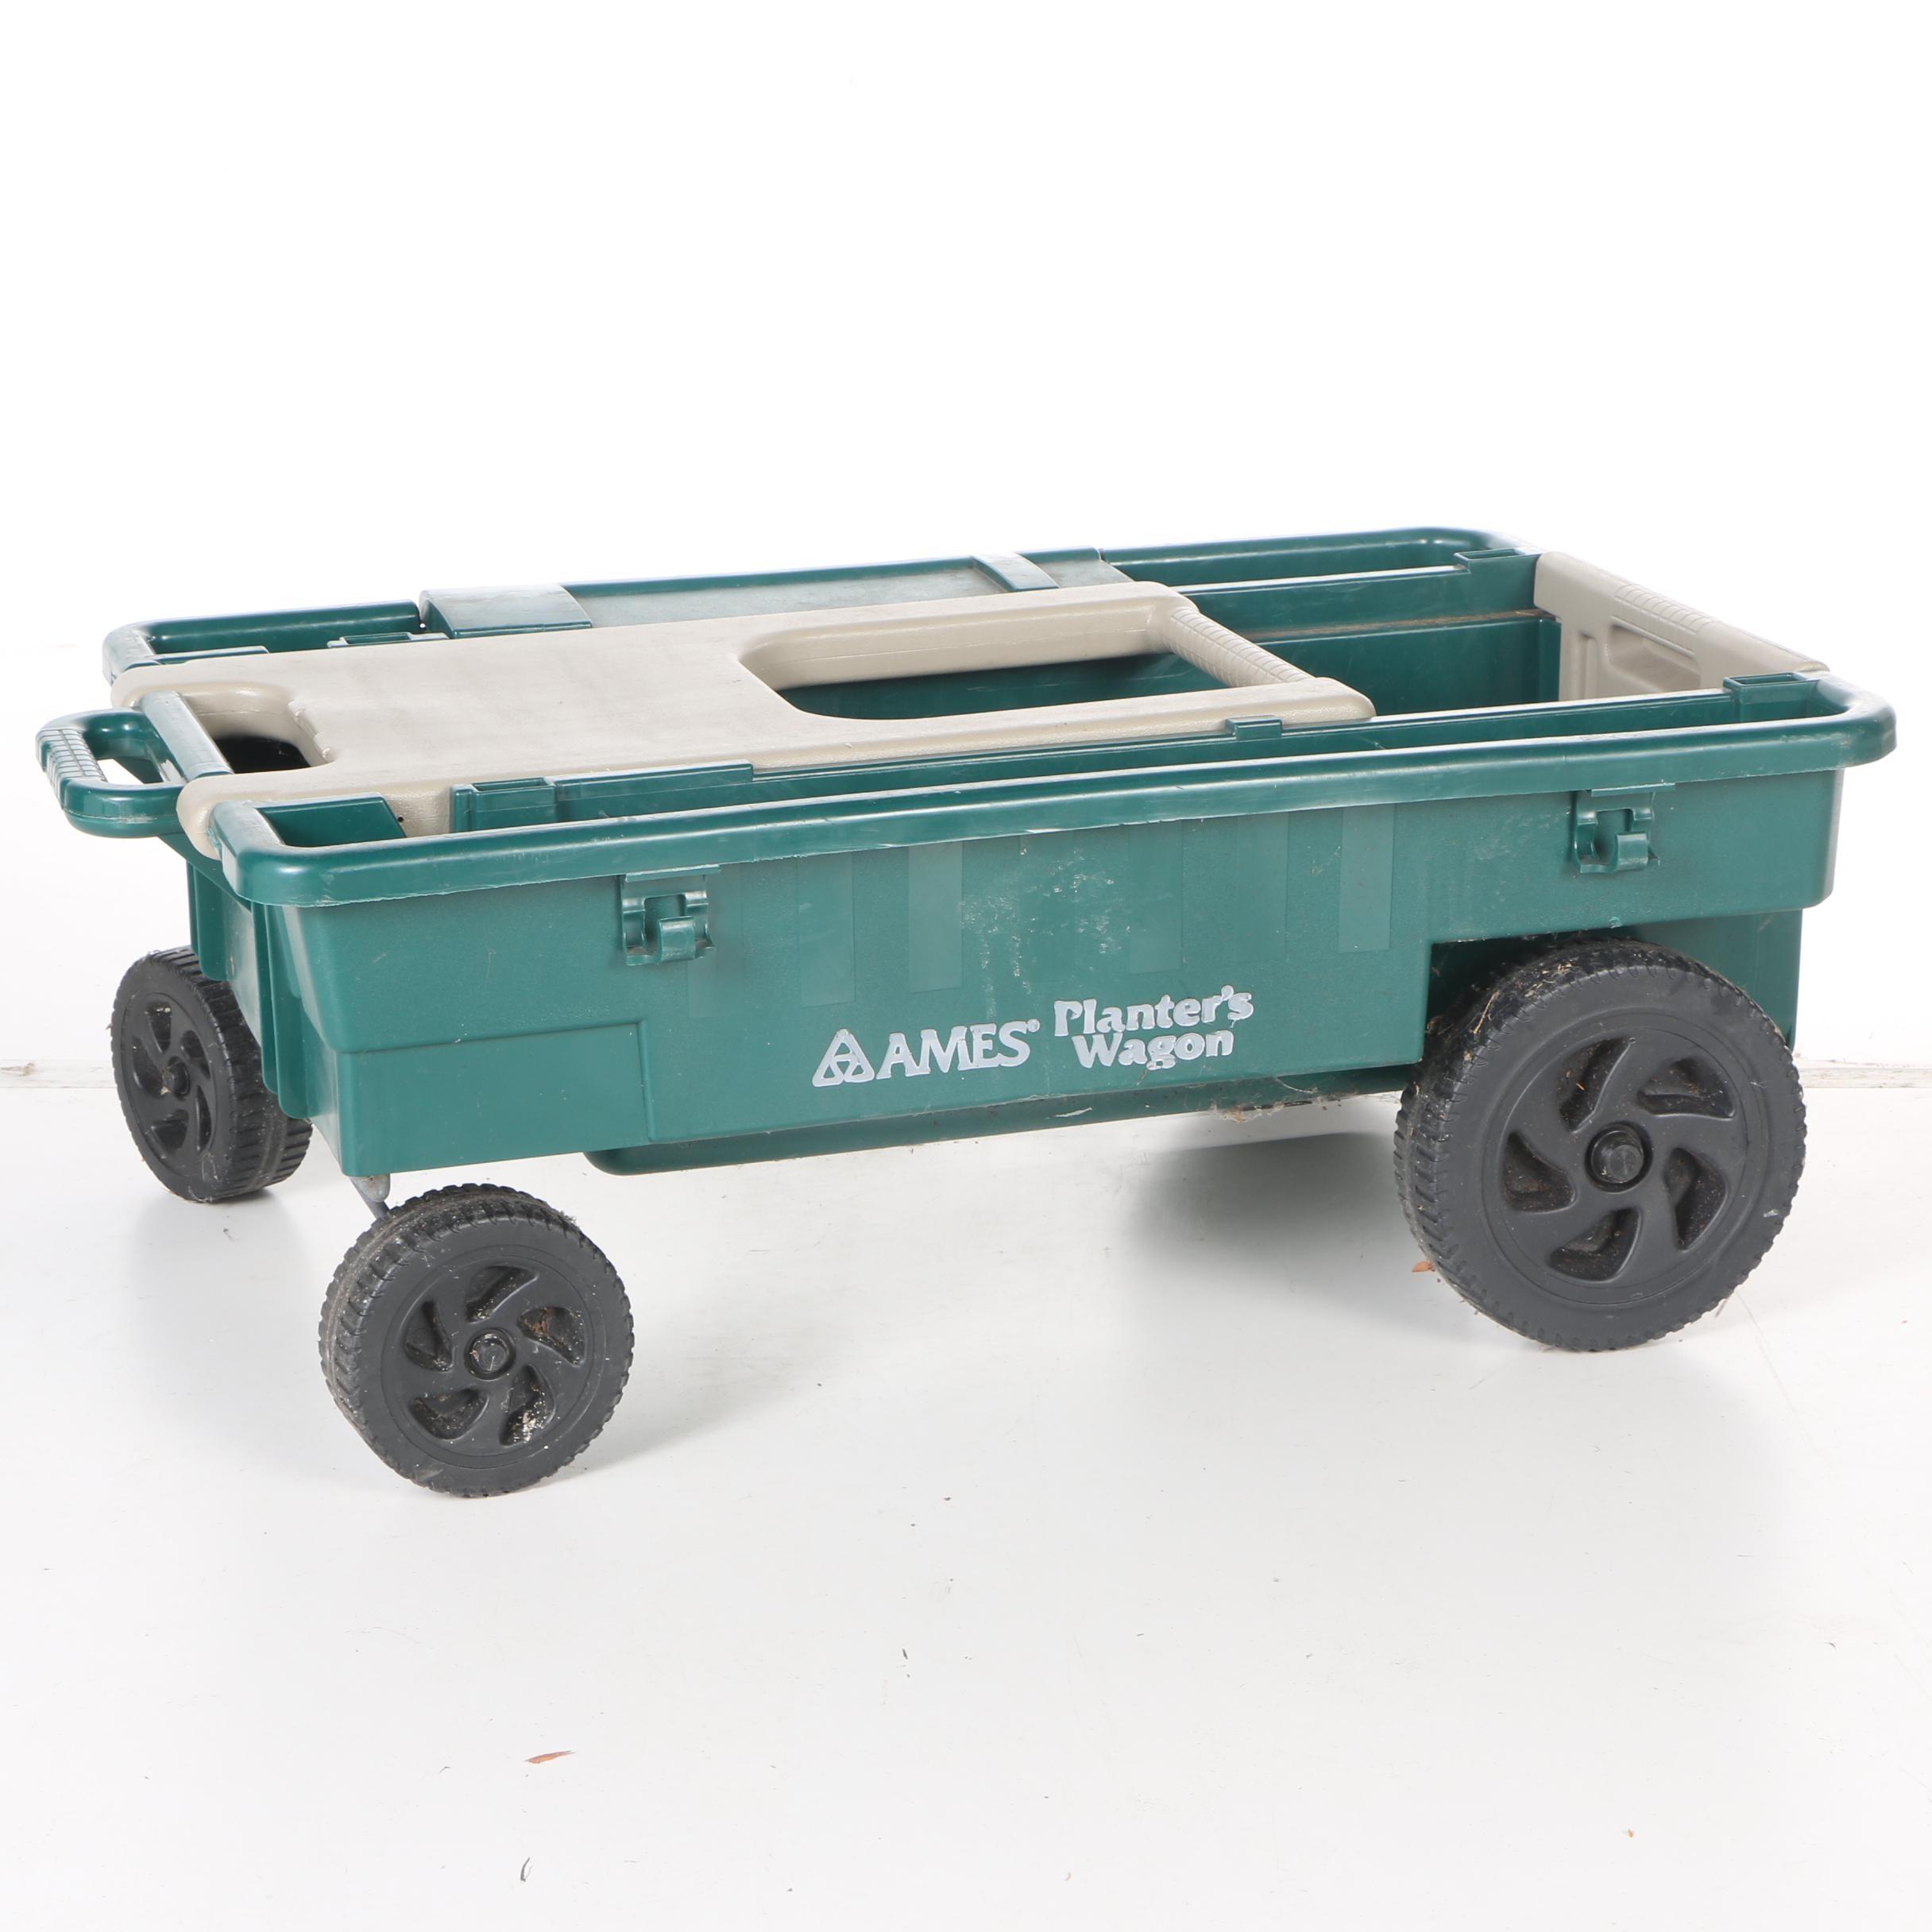 Planter's Wagon